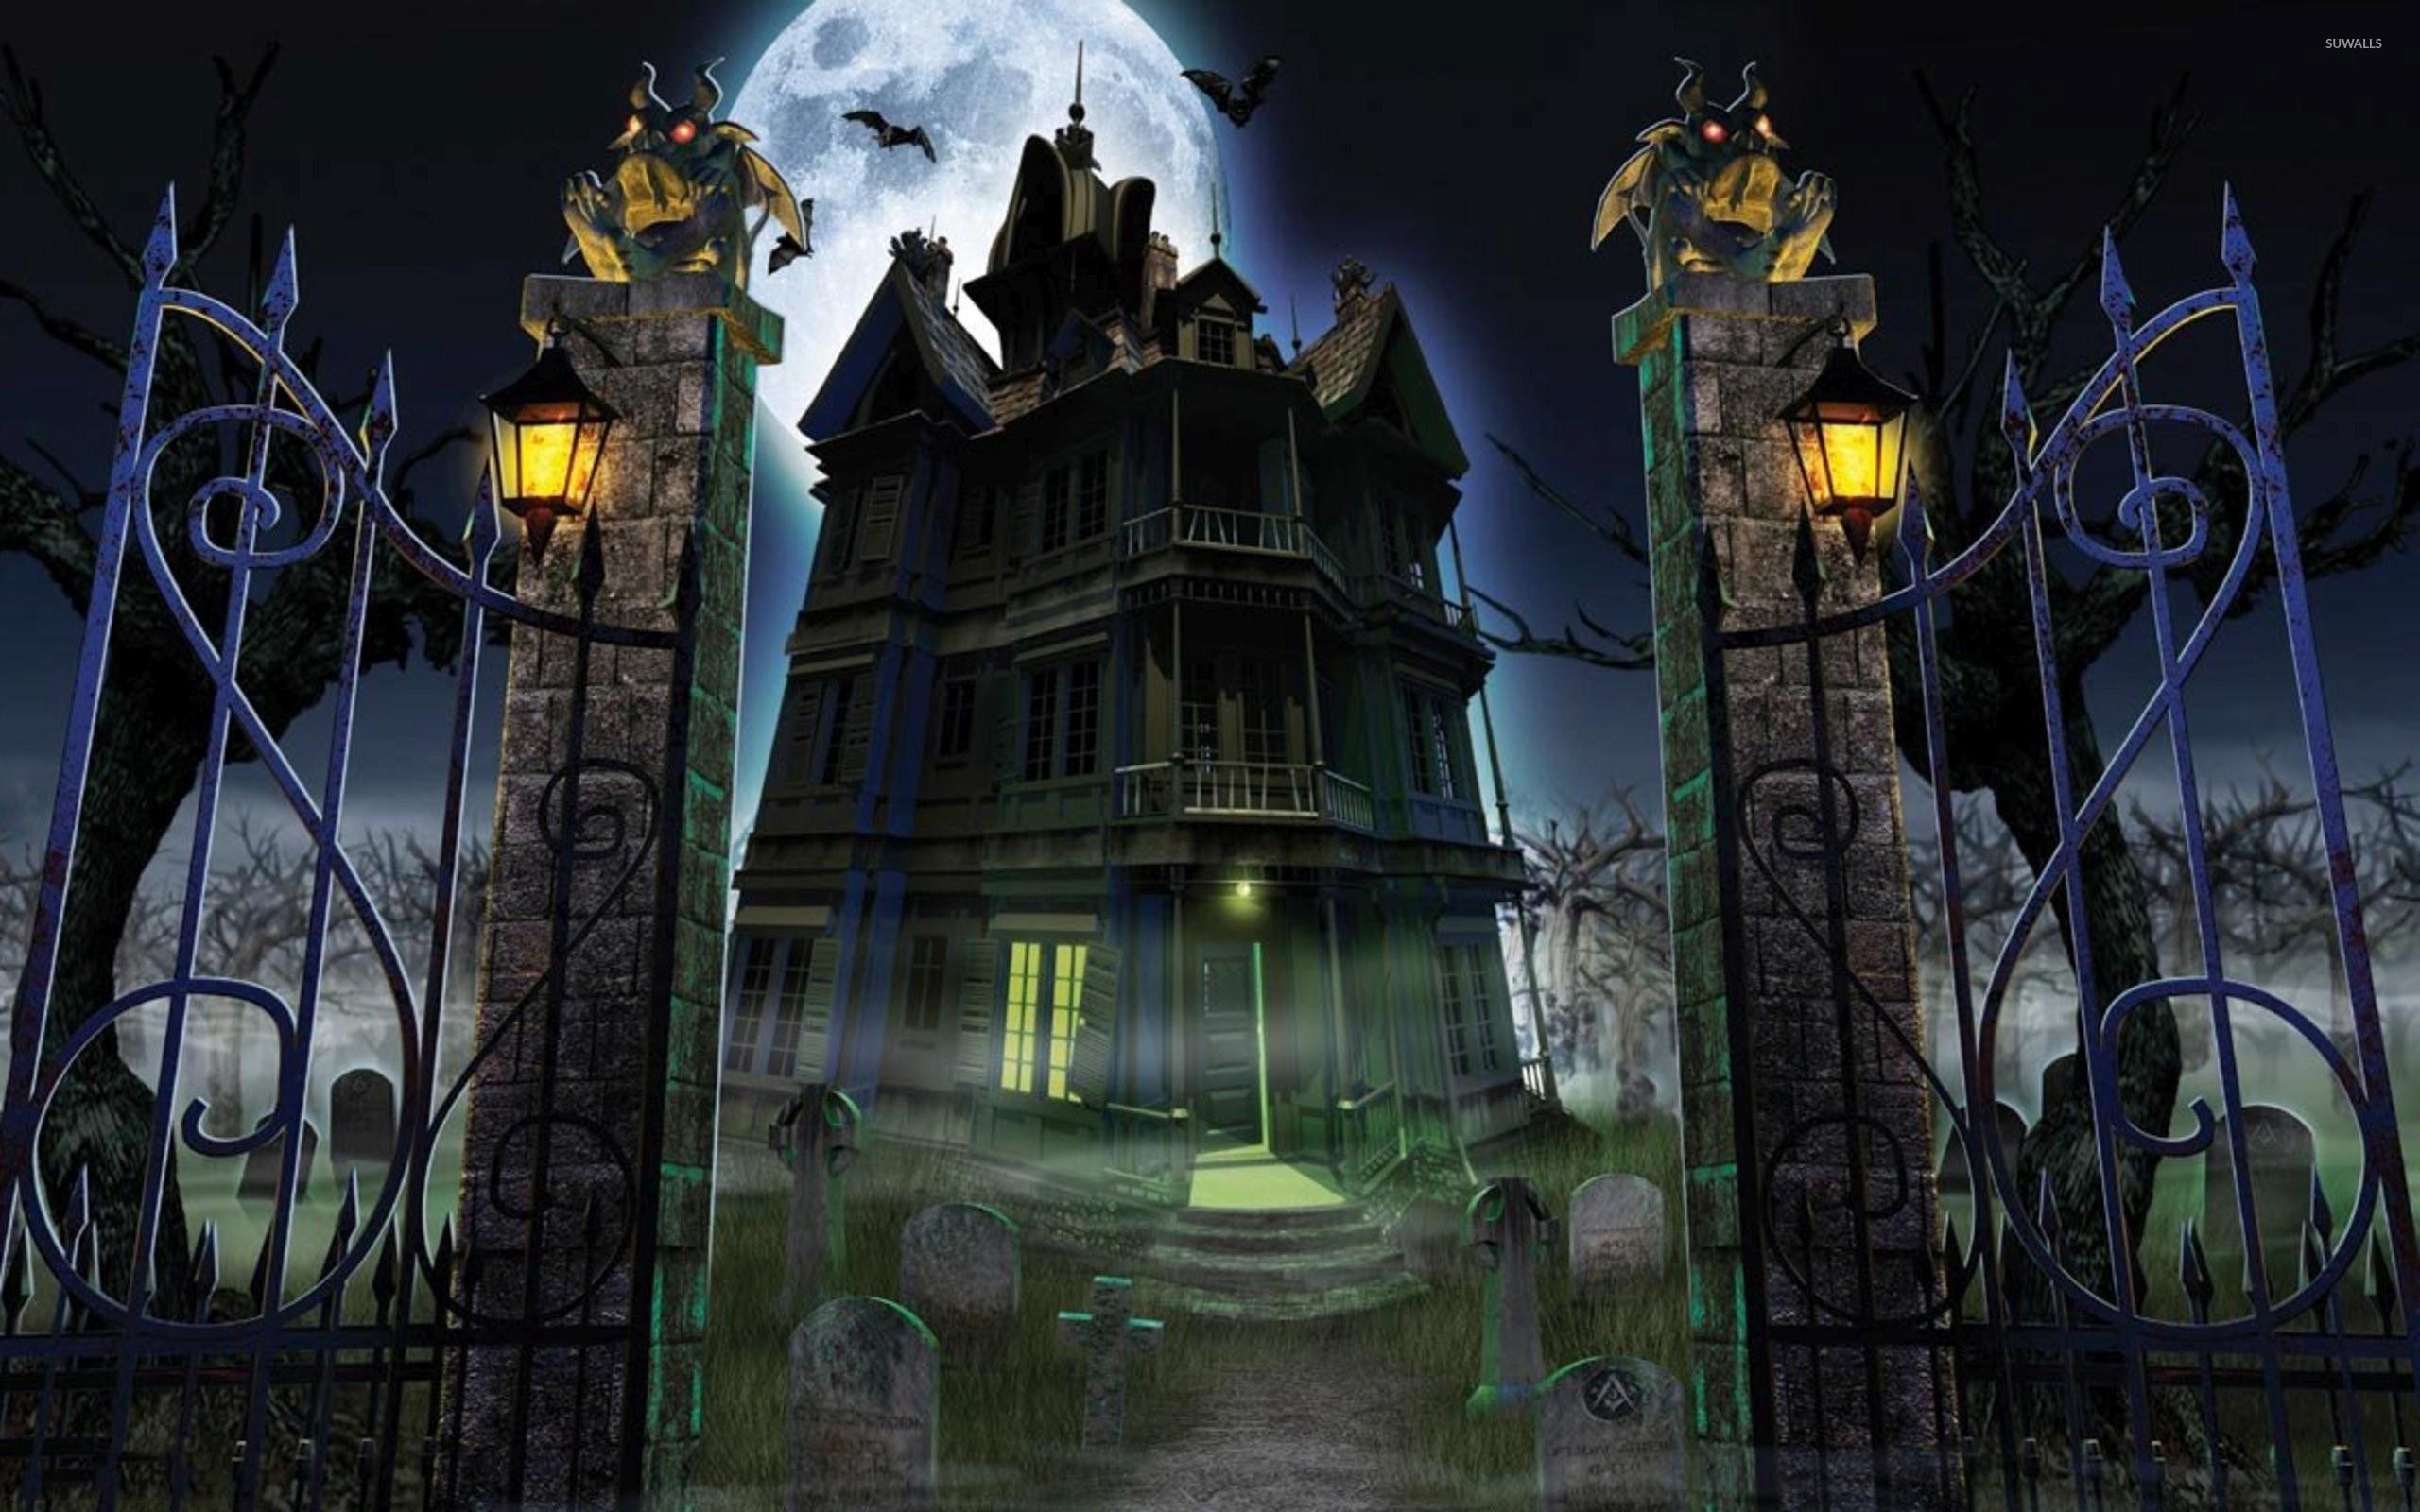 Disney Haunted Mansion Wallpaper 52 images 2560x1600